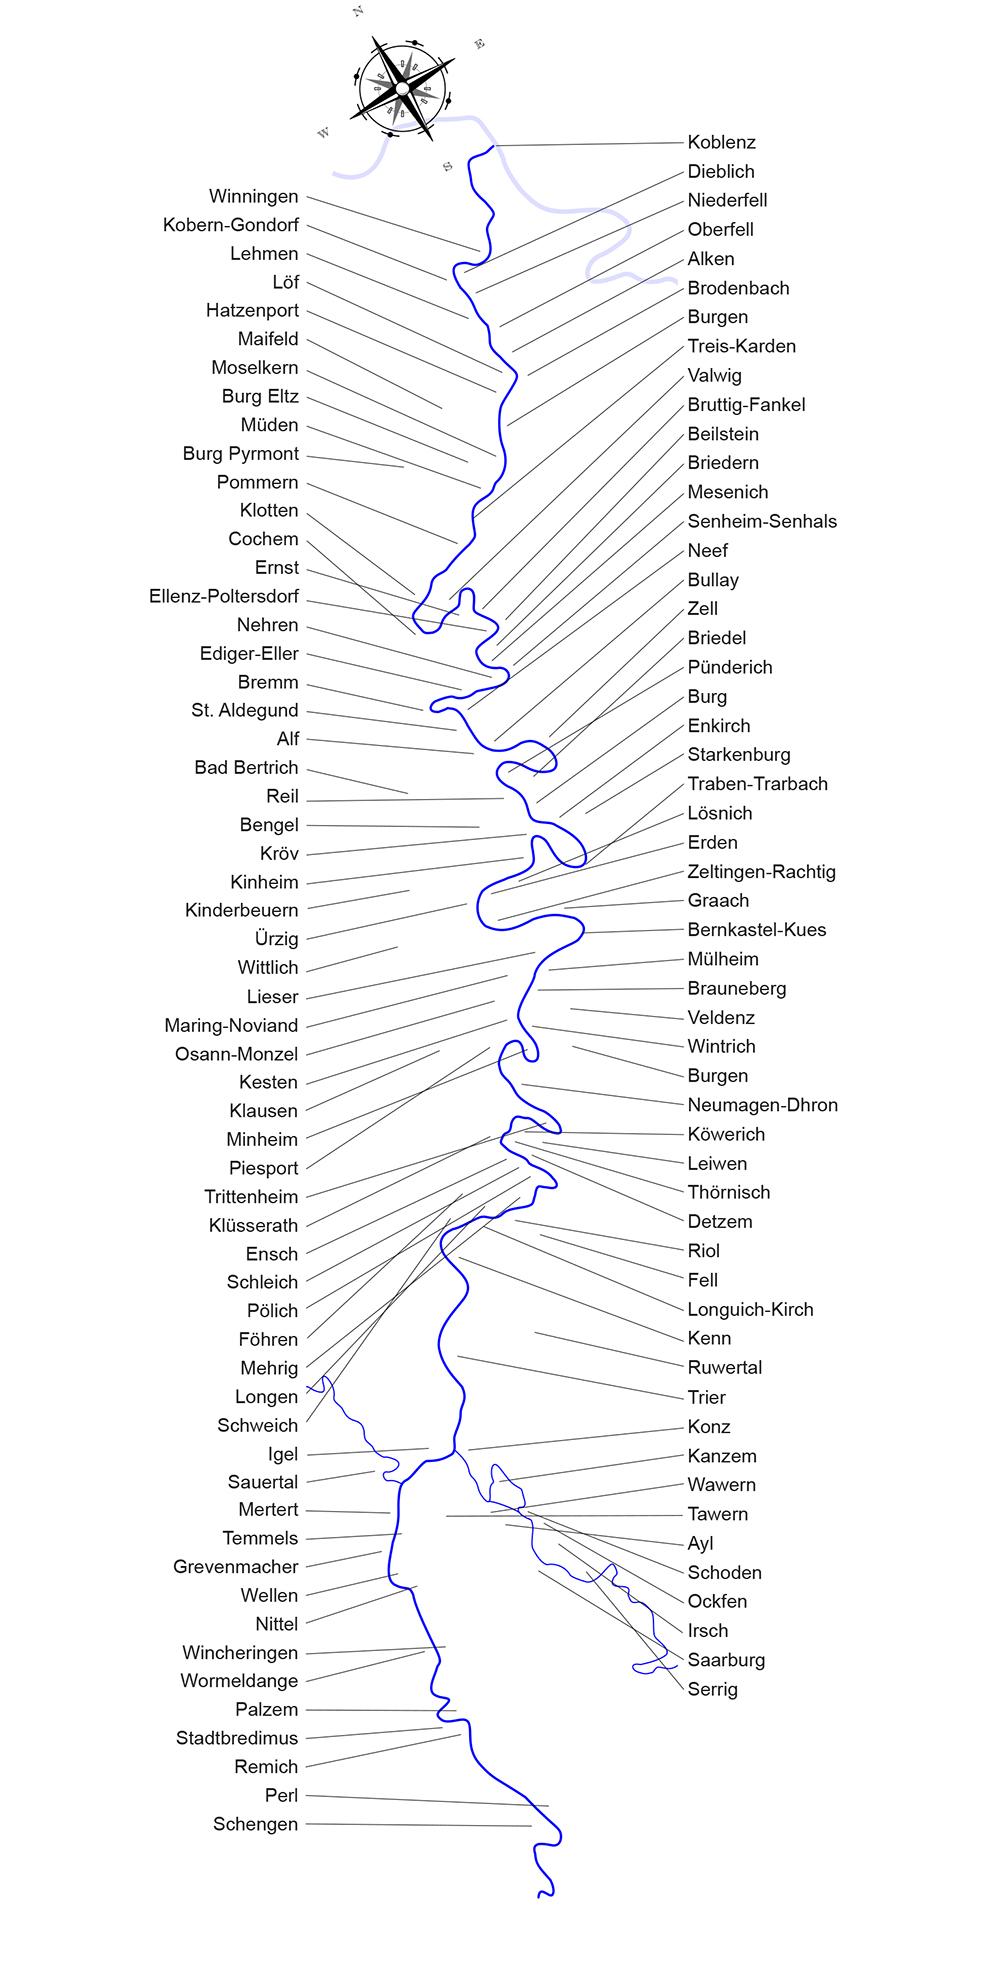 Mosel Karte Mit Allen Orten.Moselorte Karte Onlinebieb